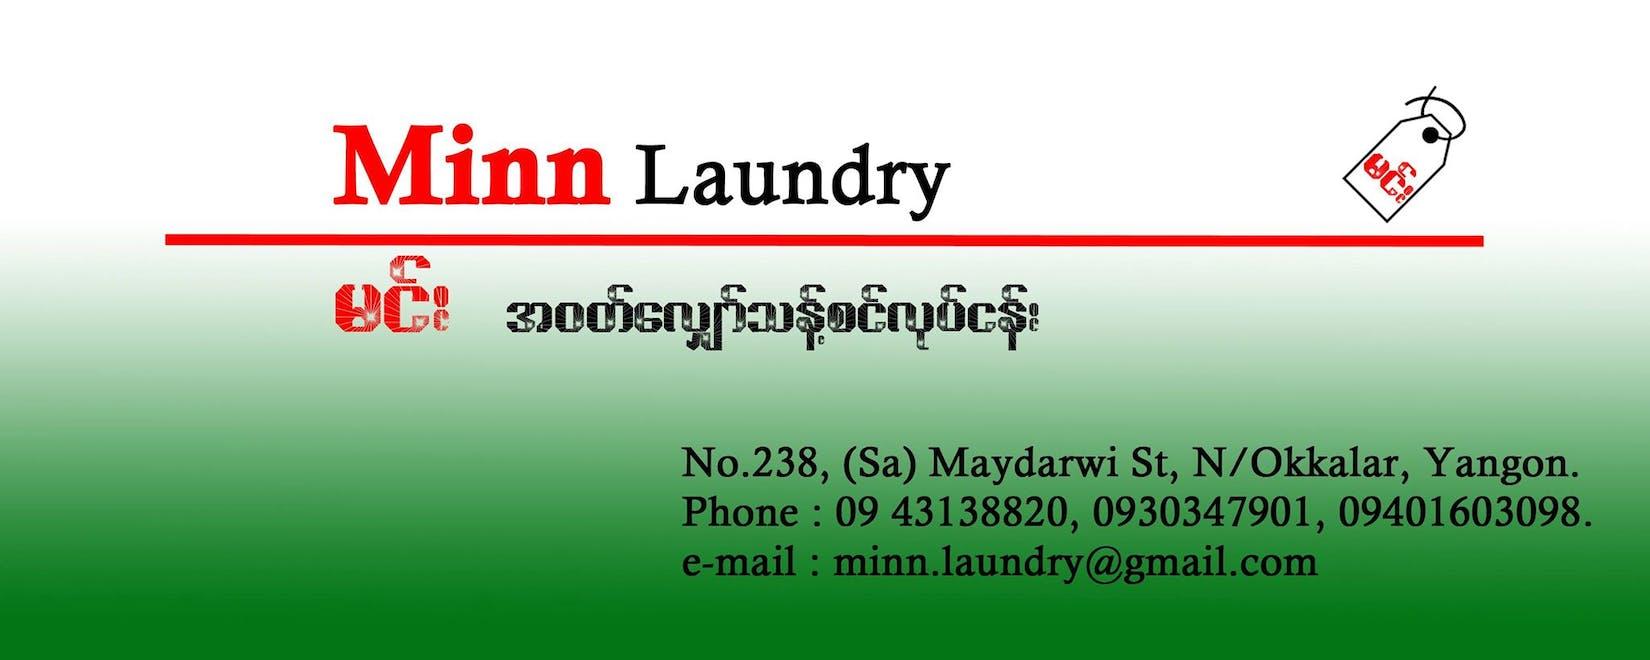 Minn Laundry | Beauty